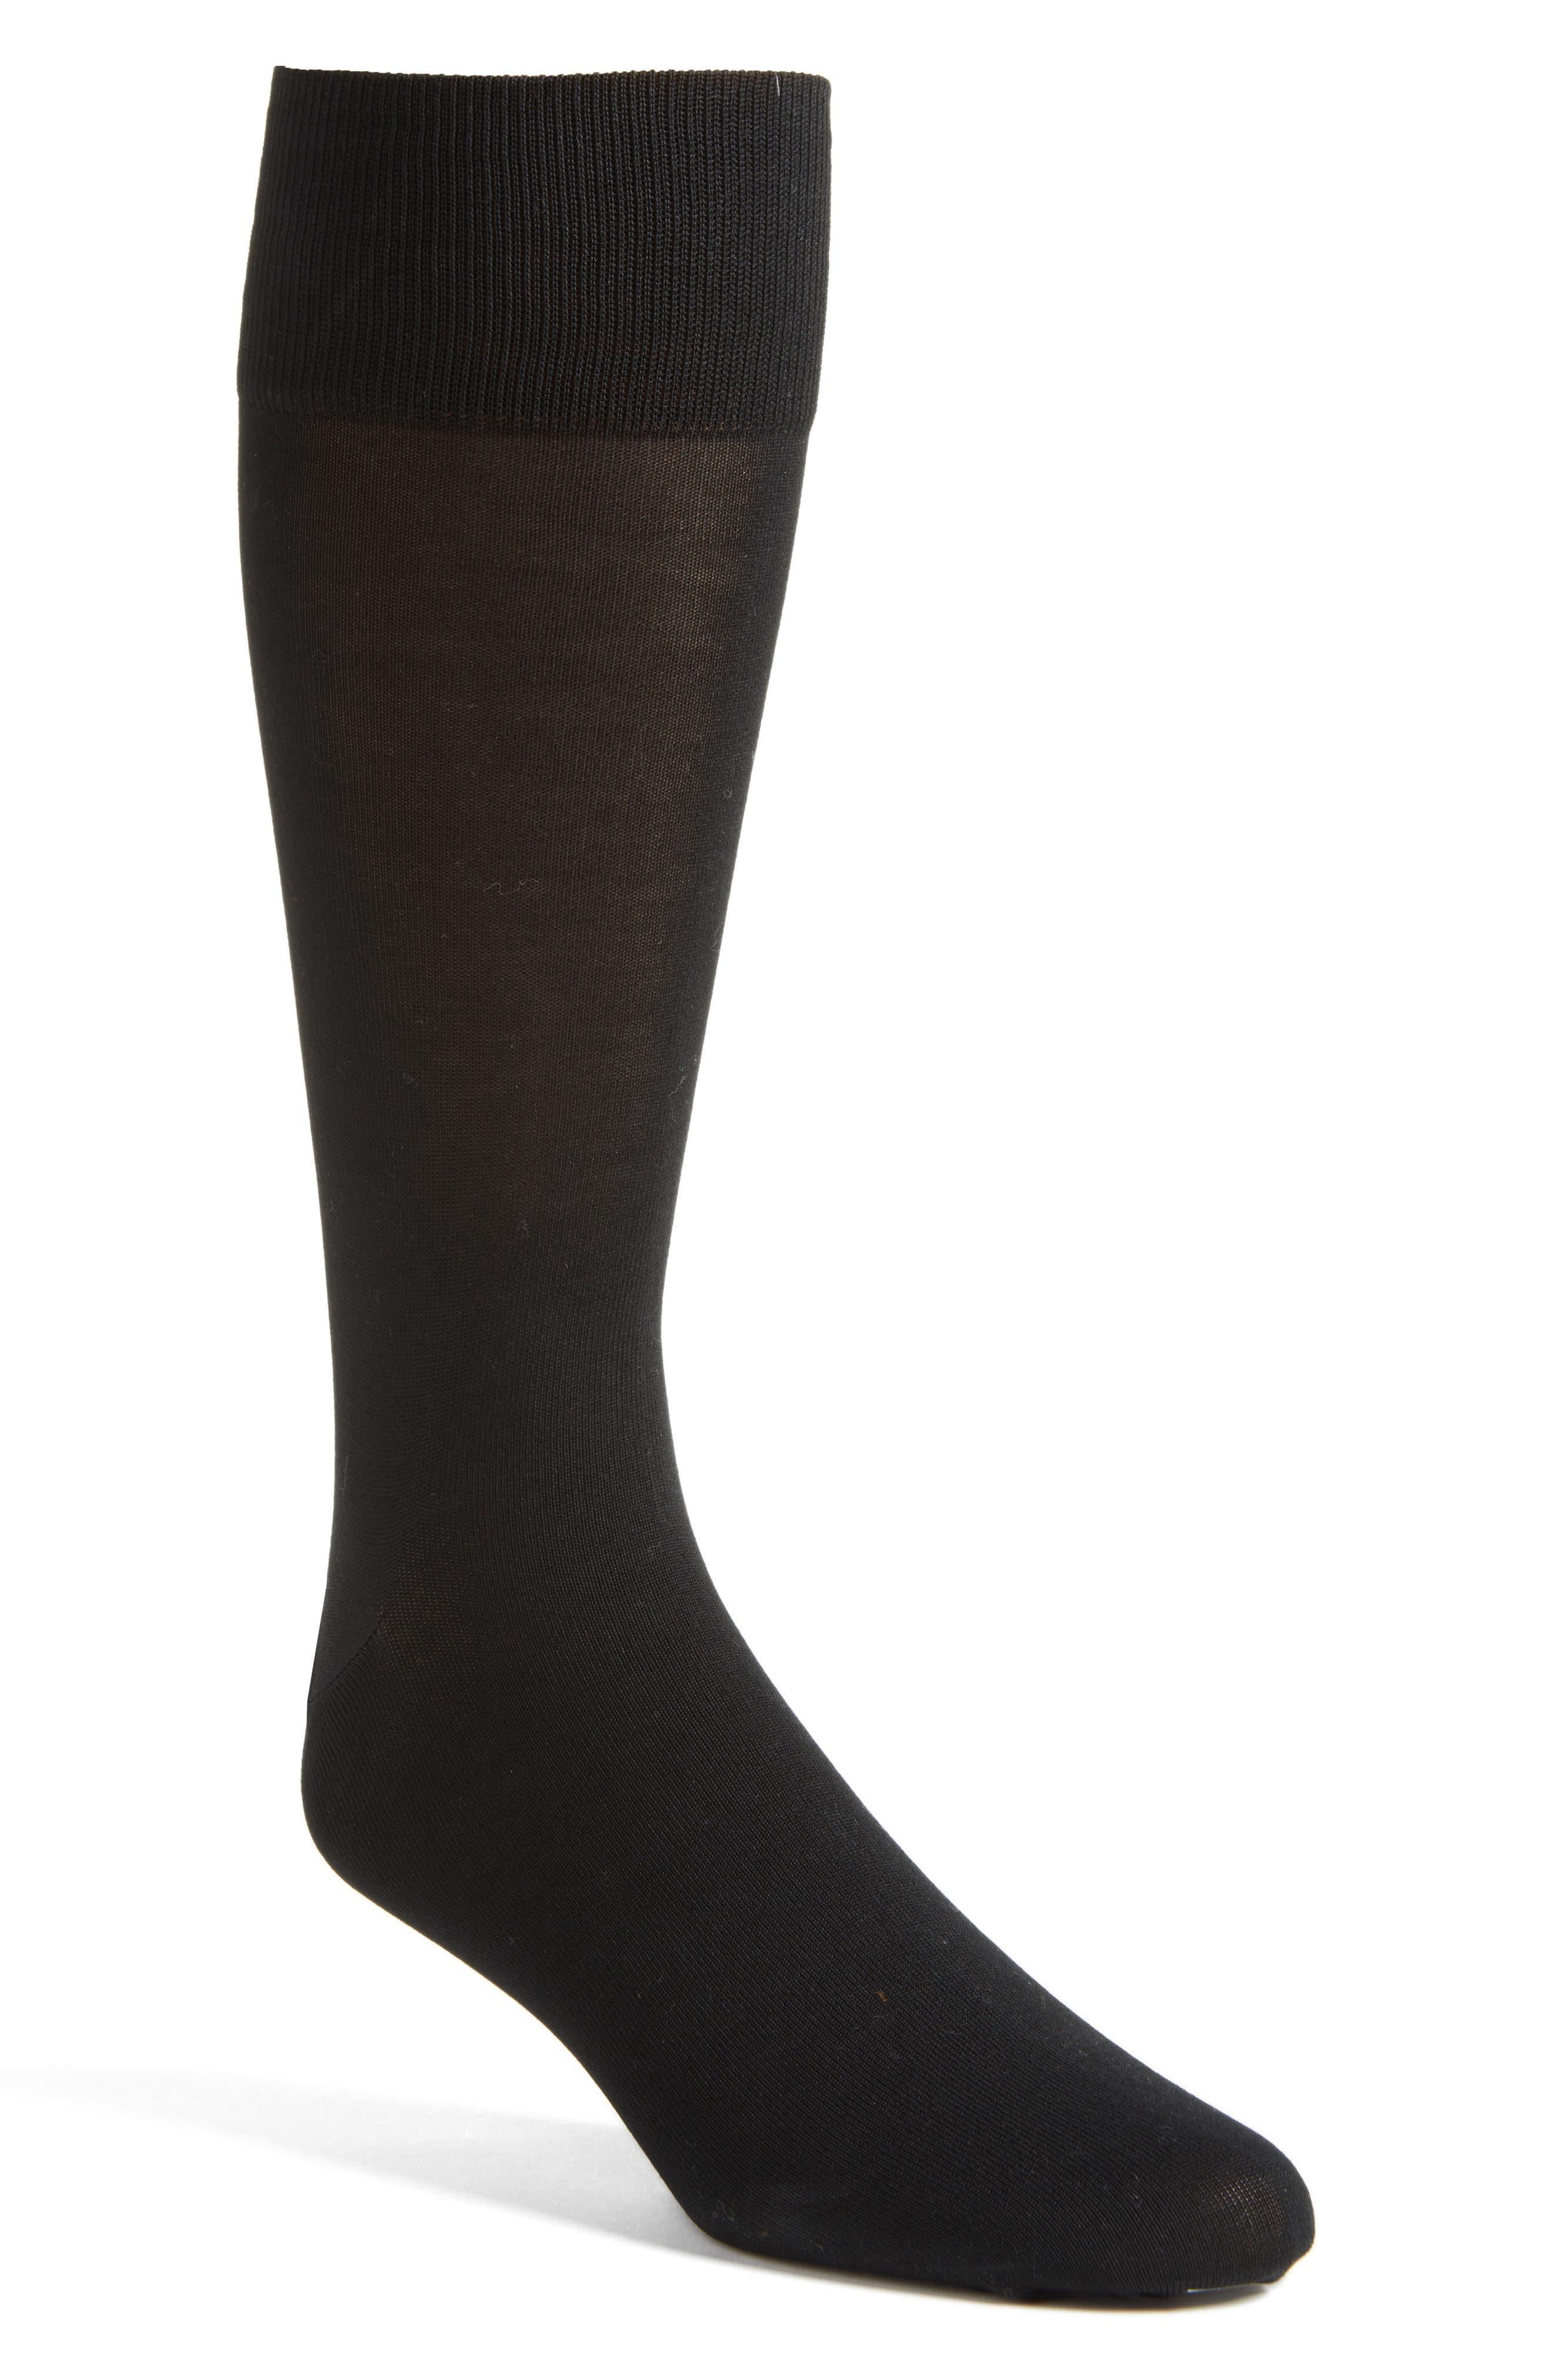 Alternate Image 1 Selected - John W. Nordstrom® Solid Socks